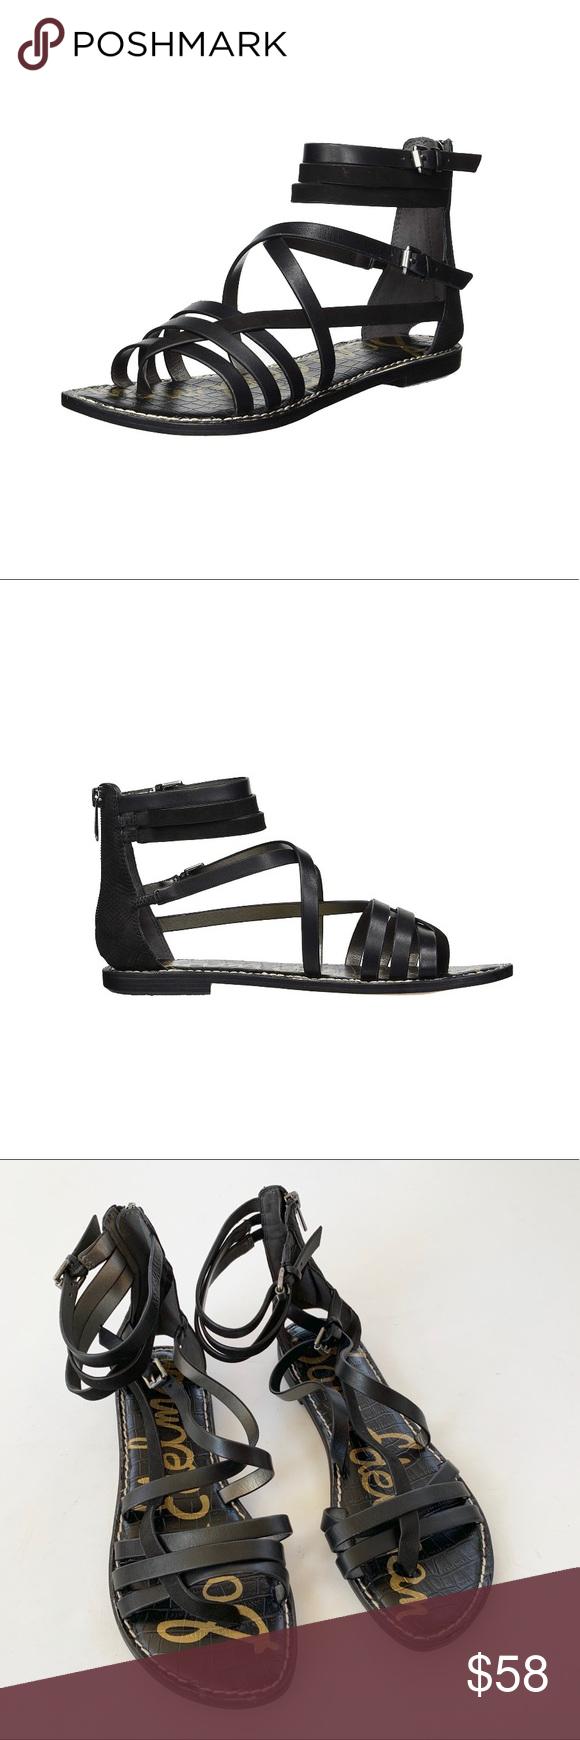 c3ccf543fd63 NWT Sam Edelman Ganesa Black Leather Sandal 8.5 Sam Edelman gladiator  inspired stewpot black leather sandal